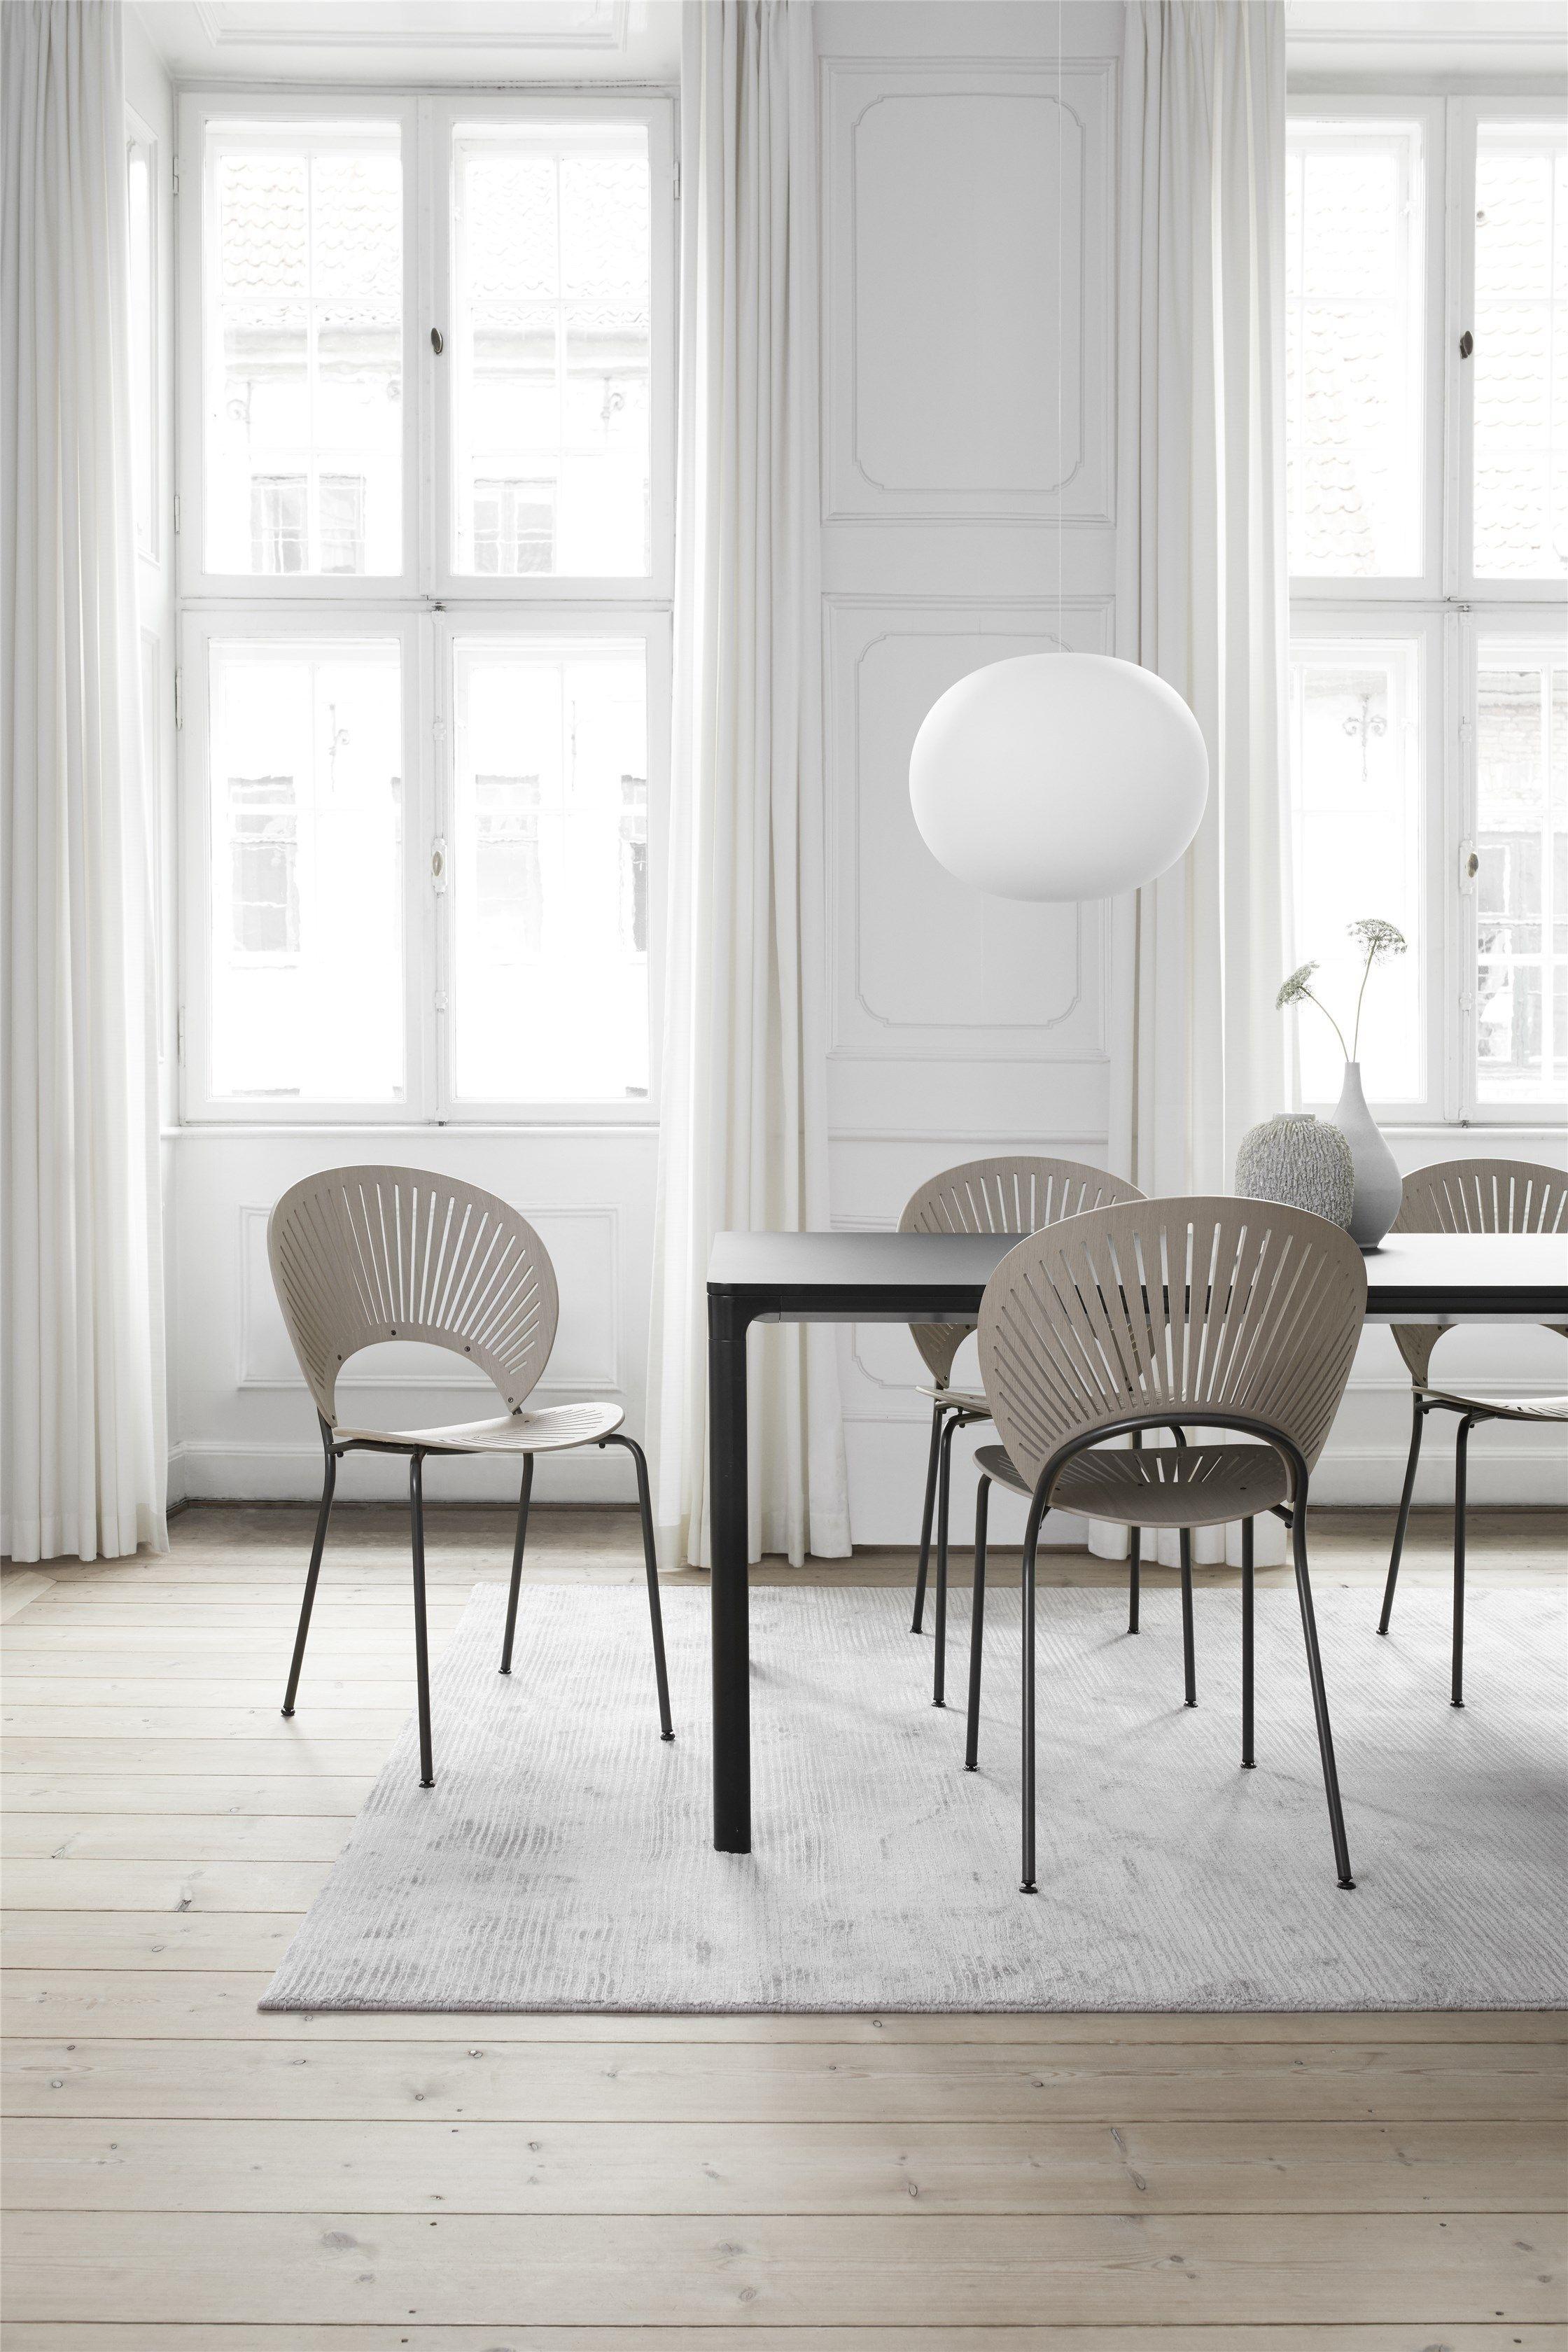 Décoration Salon Moderne Noir Et Blanc nd_3398_lightgreyoak_stained_flint_mood4 (2240×3360